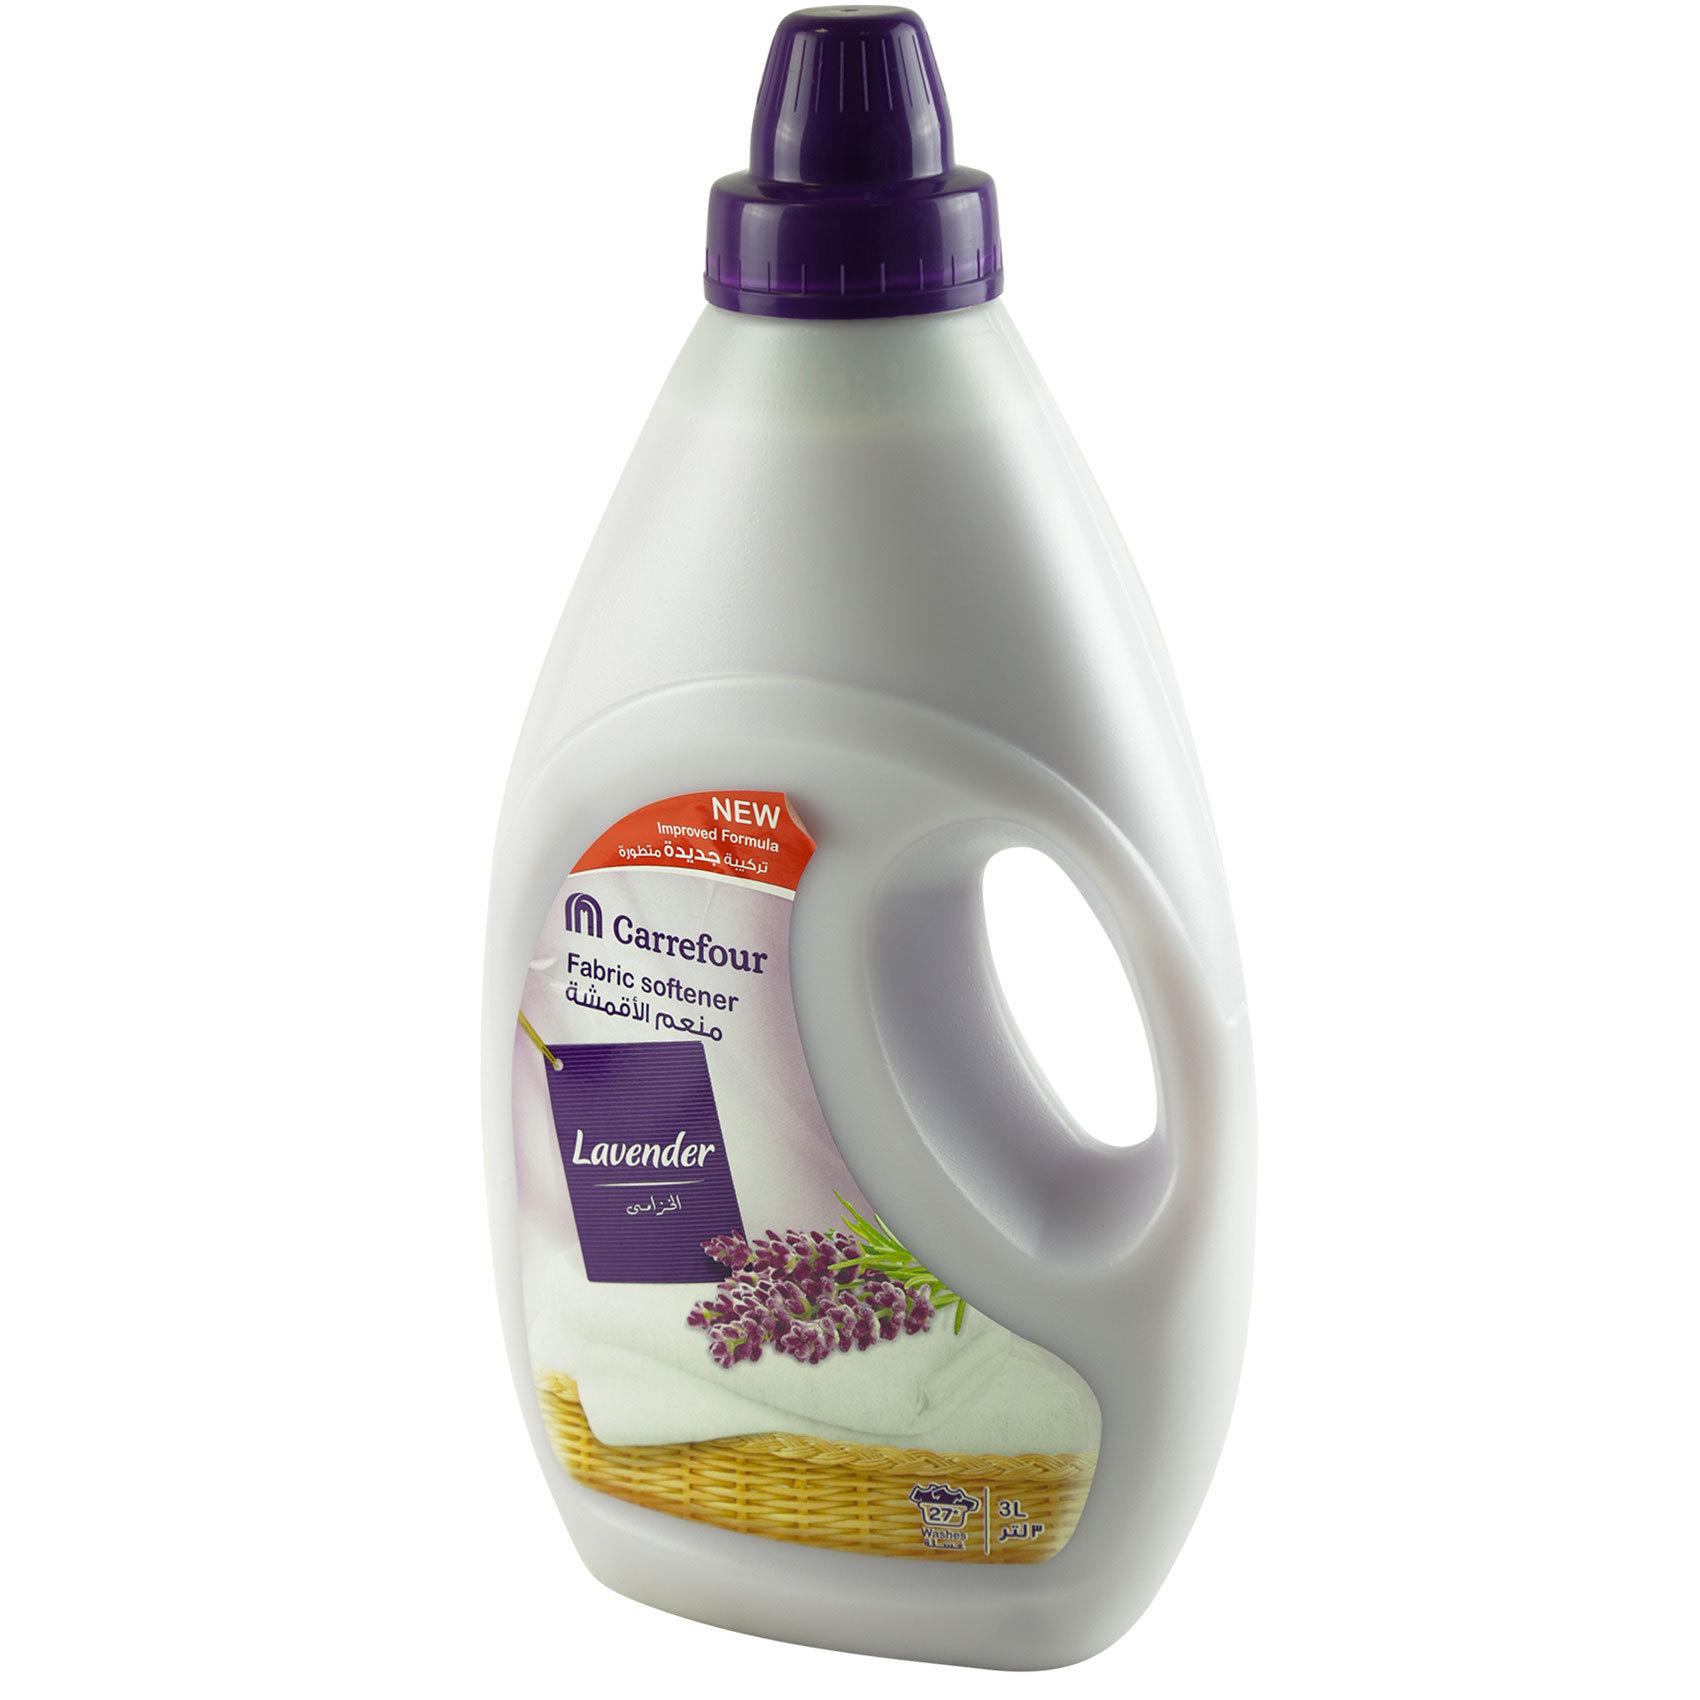 Buy Carrefour Fabric Softener Regular Lavender 3l Online In Uae Vk Foaming Dew Crf Lavendar